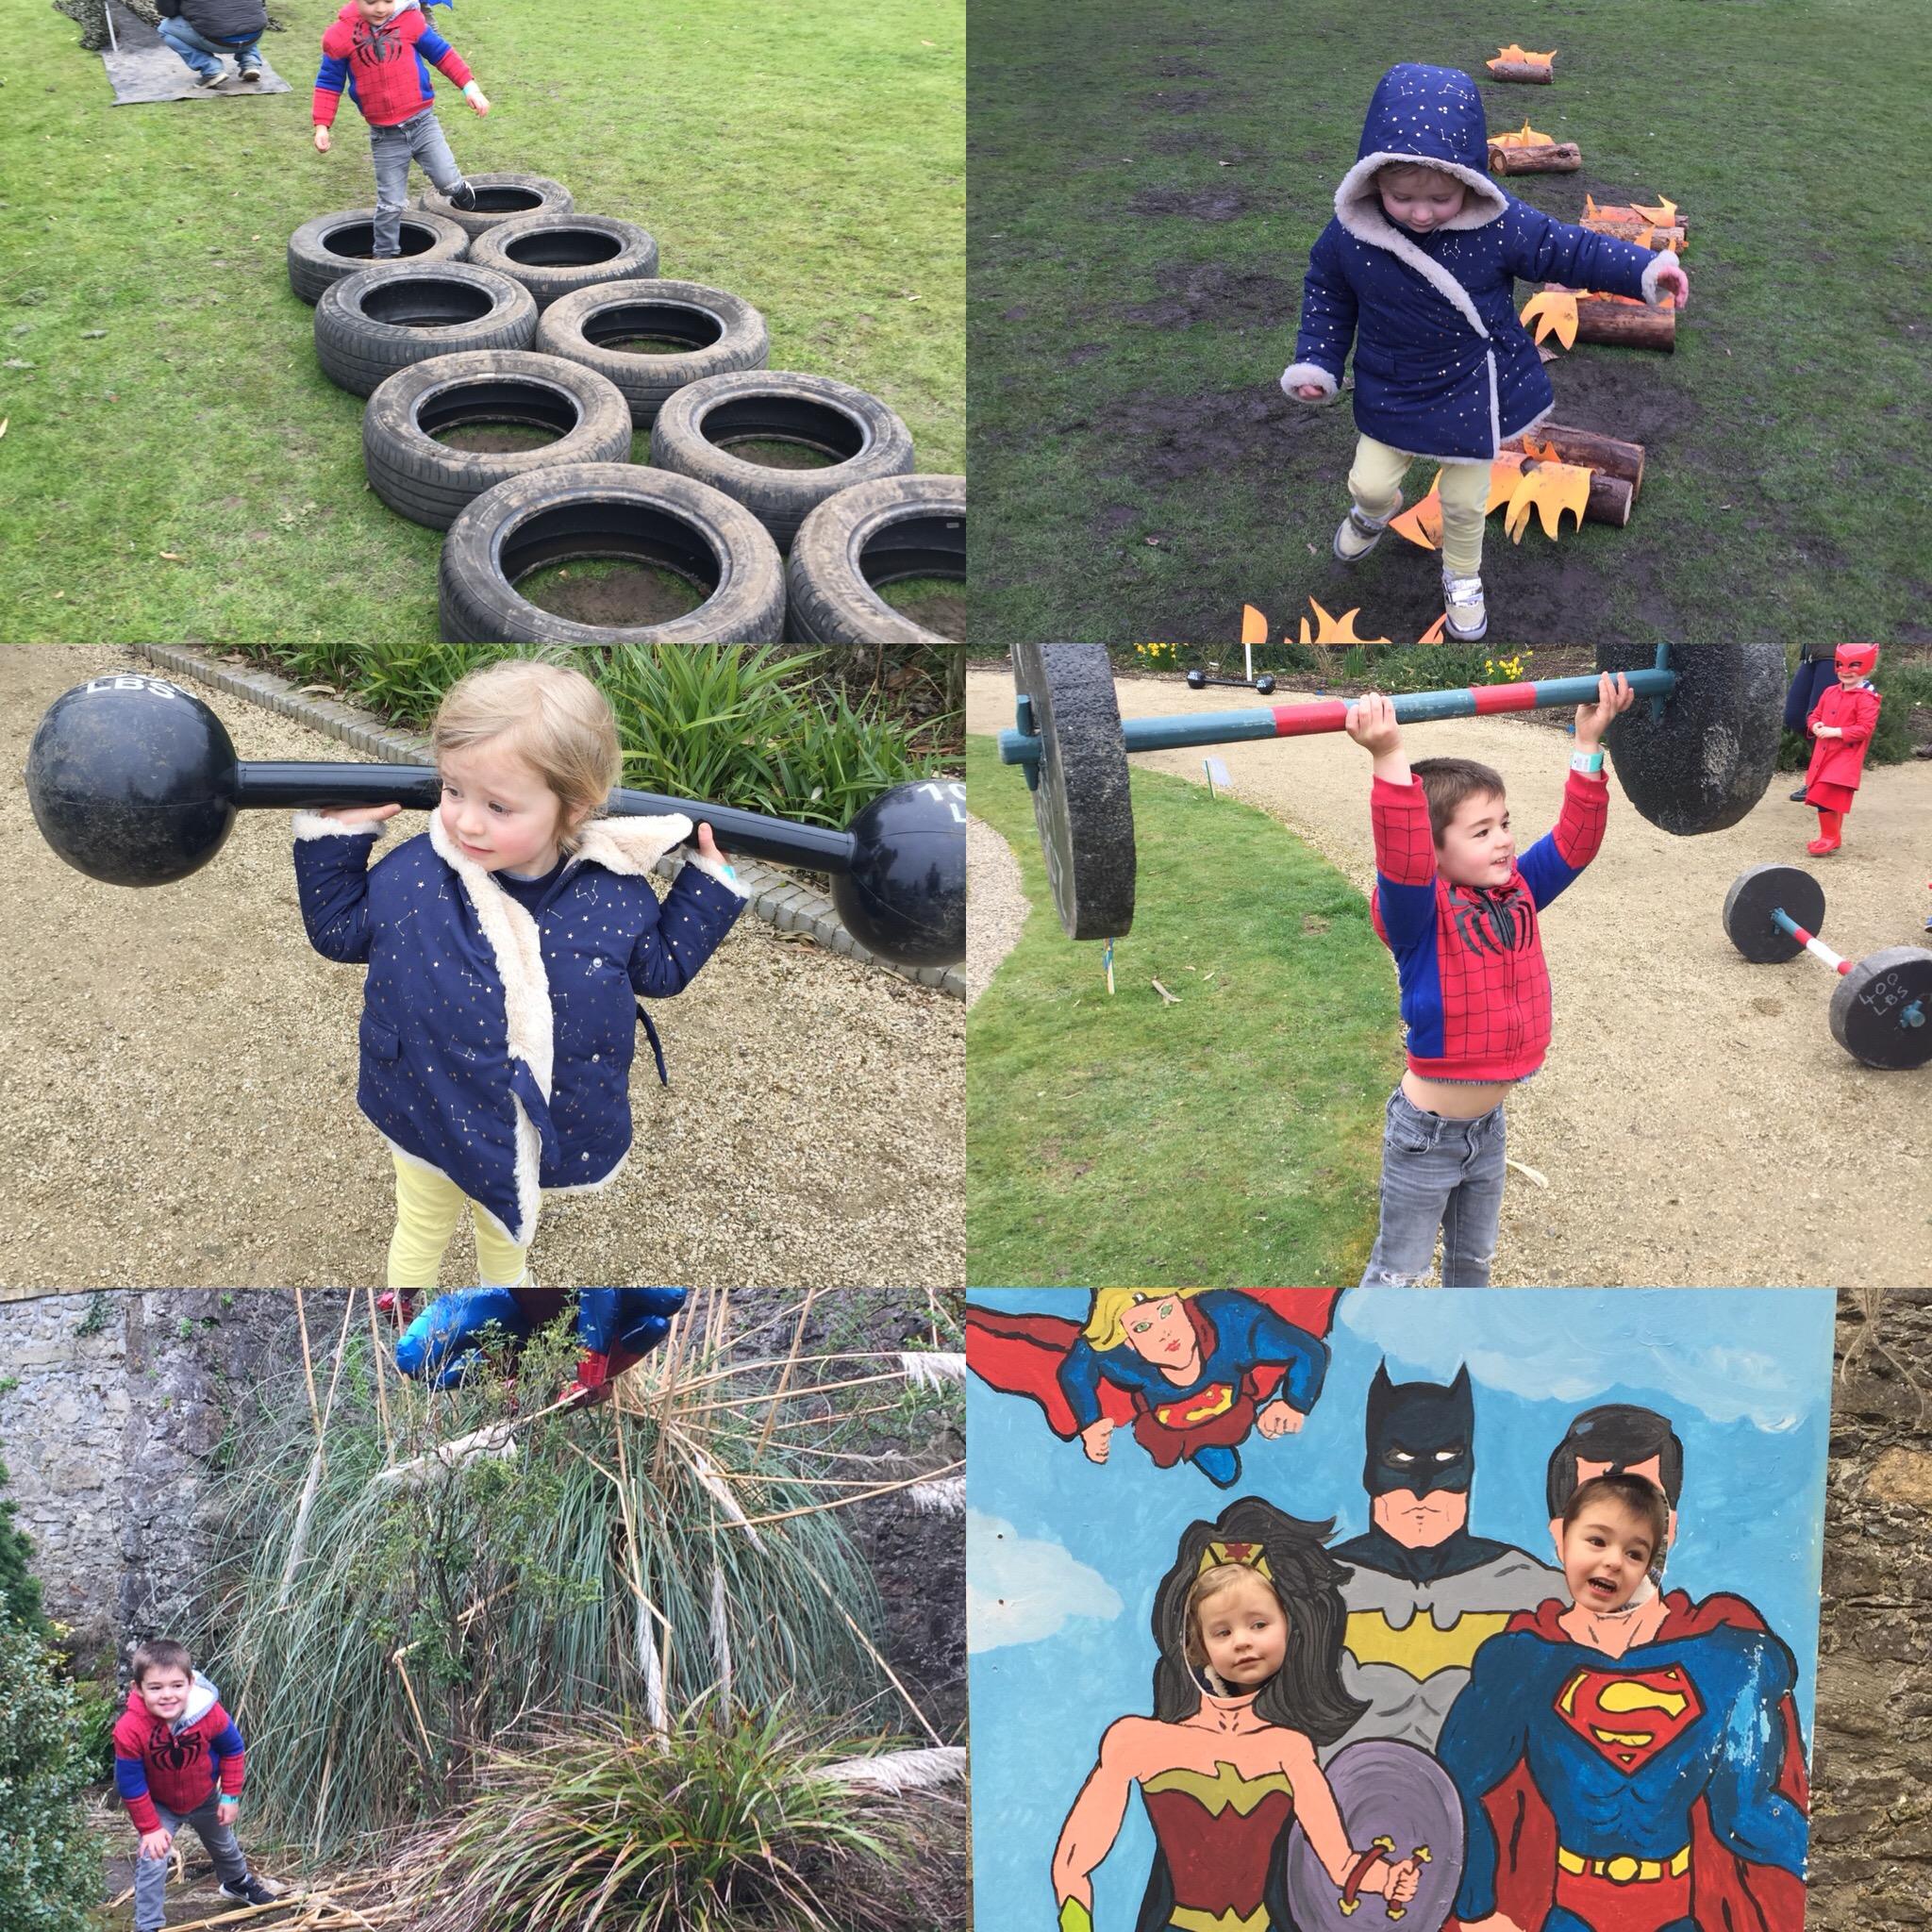 Malahide Castle always has great events for kids